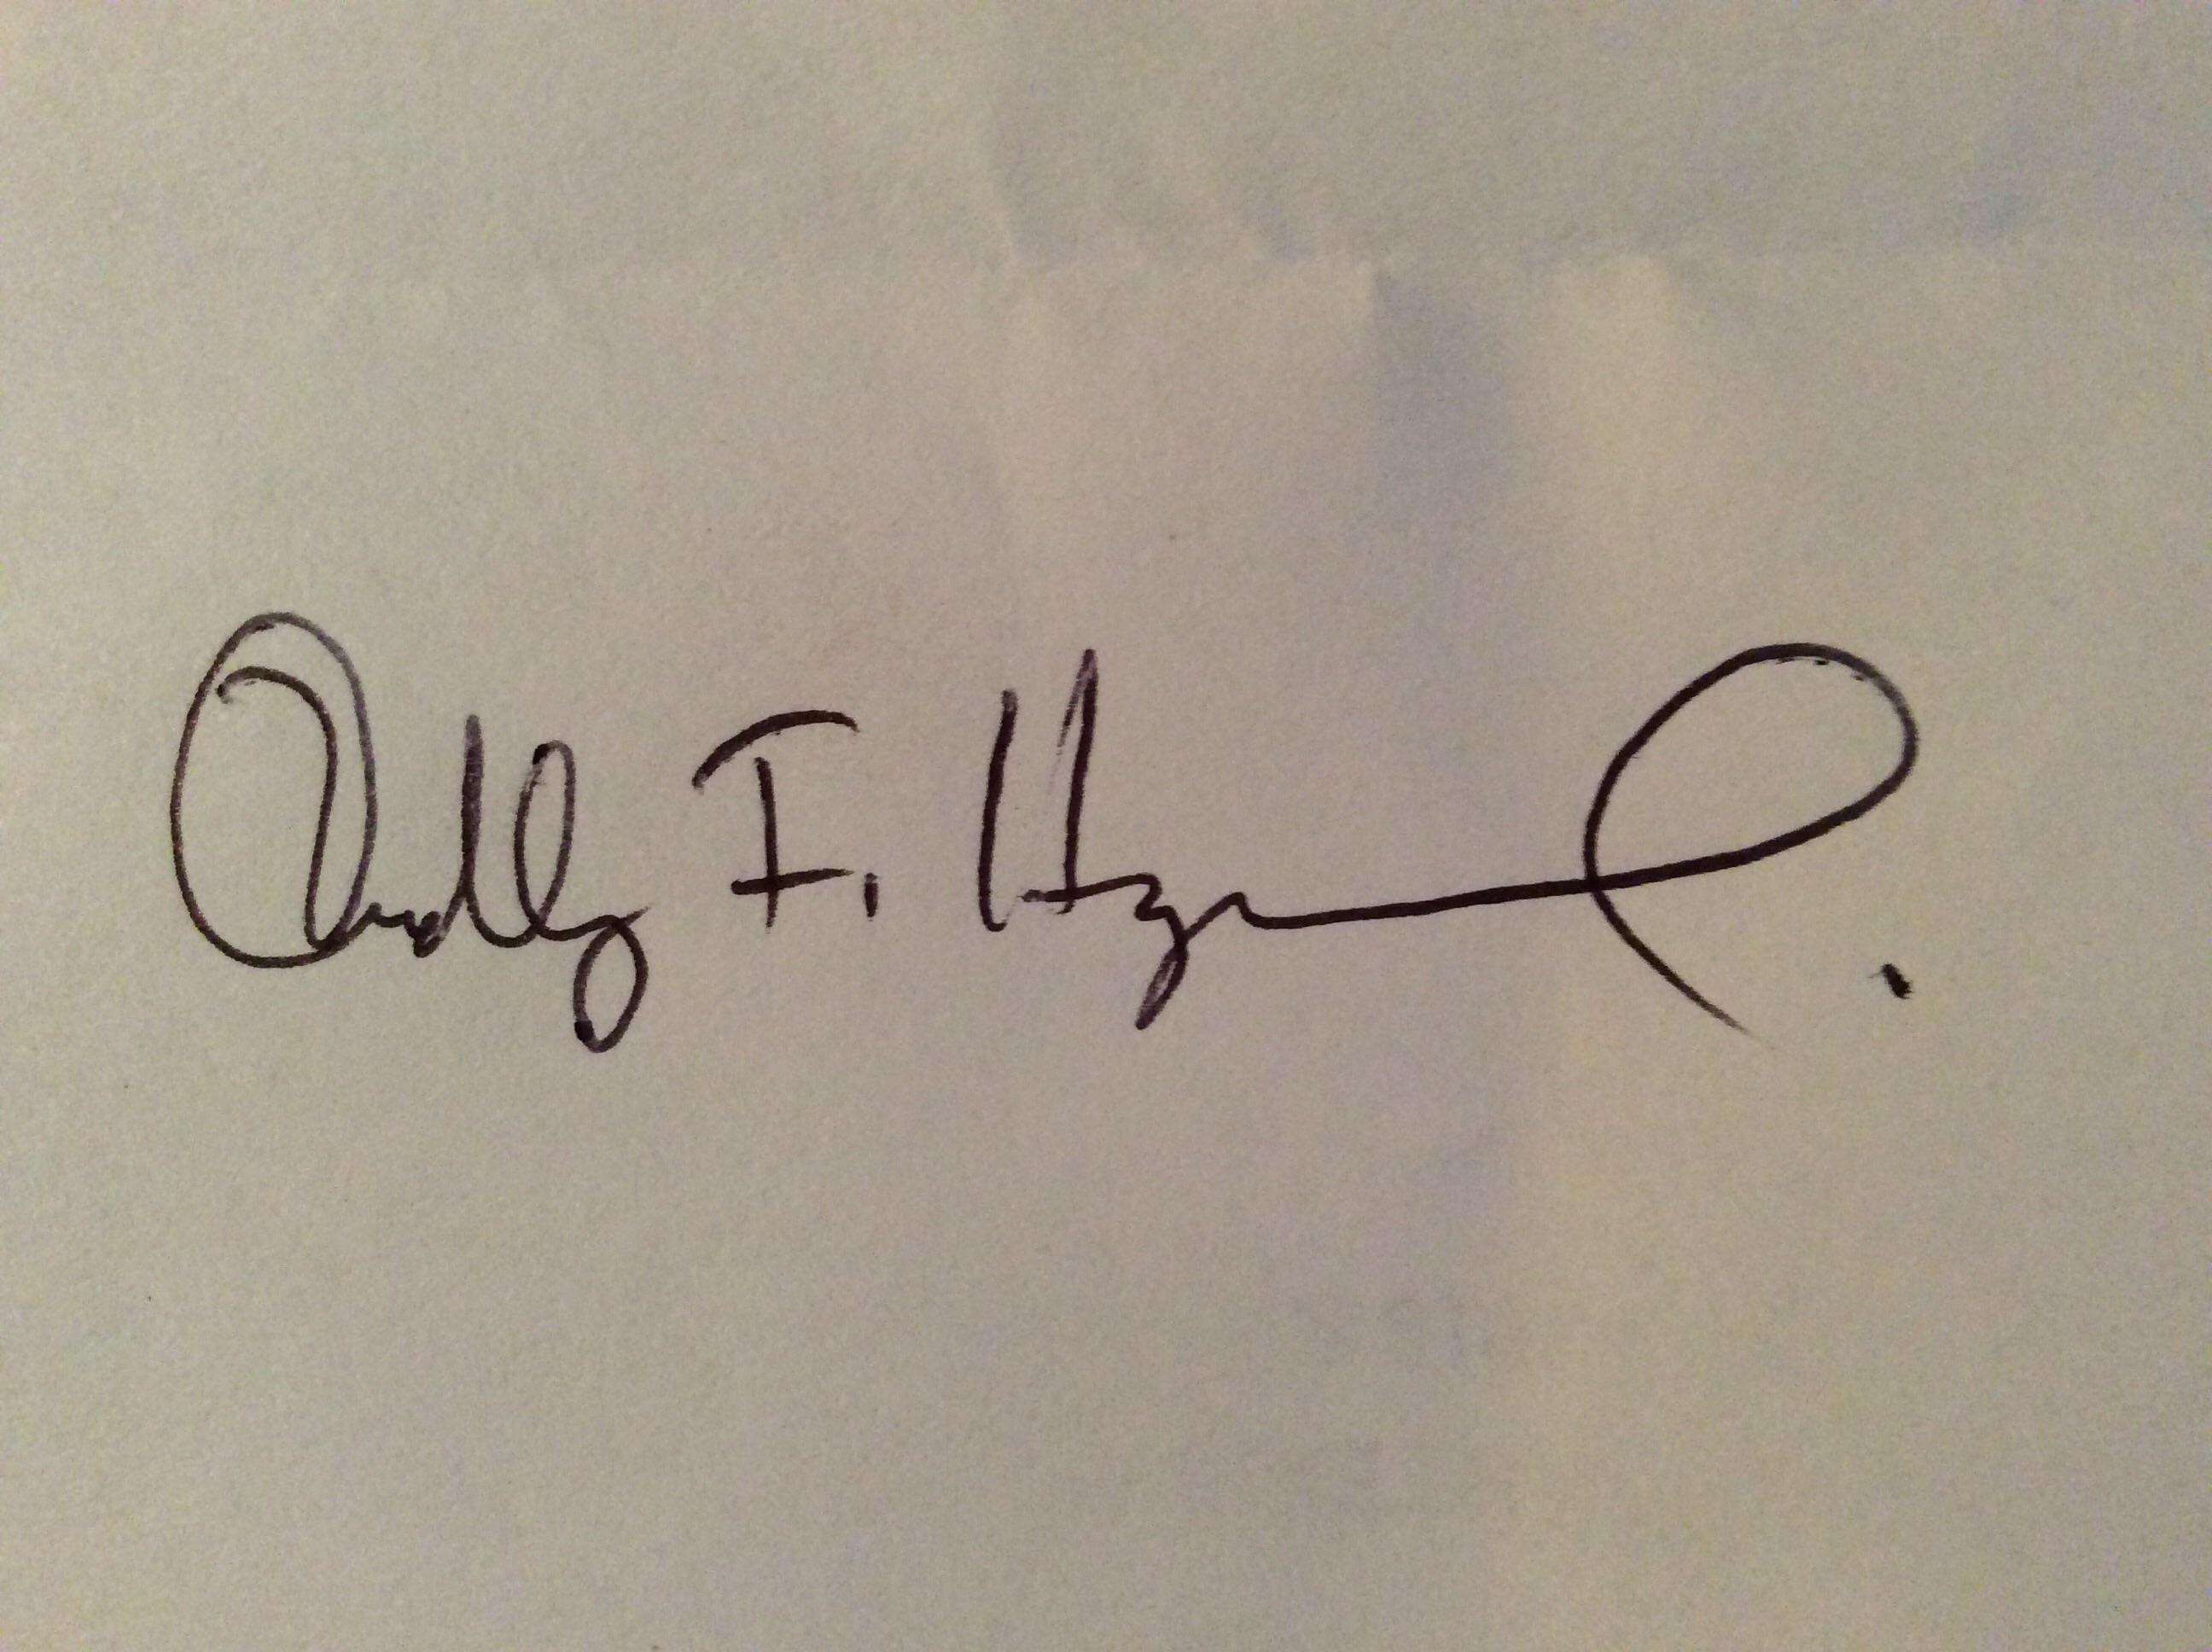 Dudley F Hayward's Signature